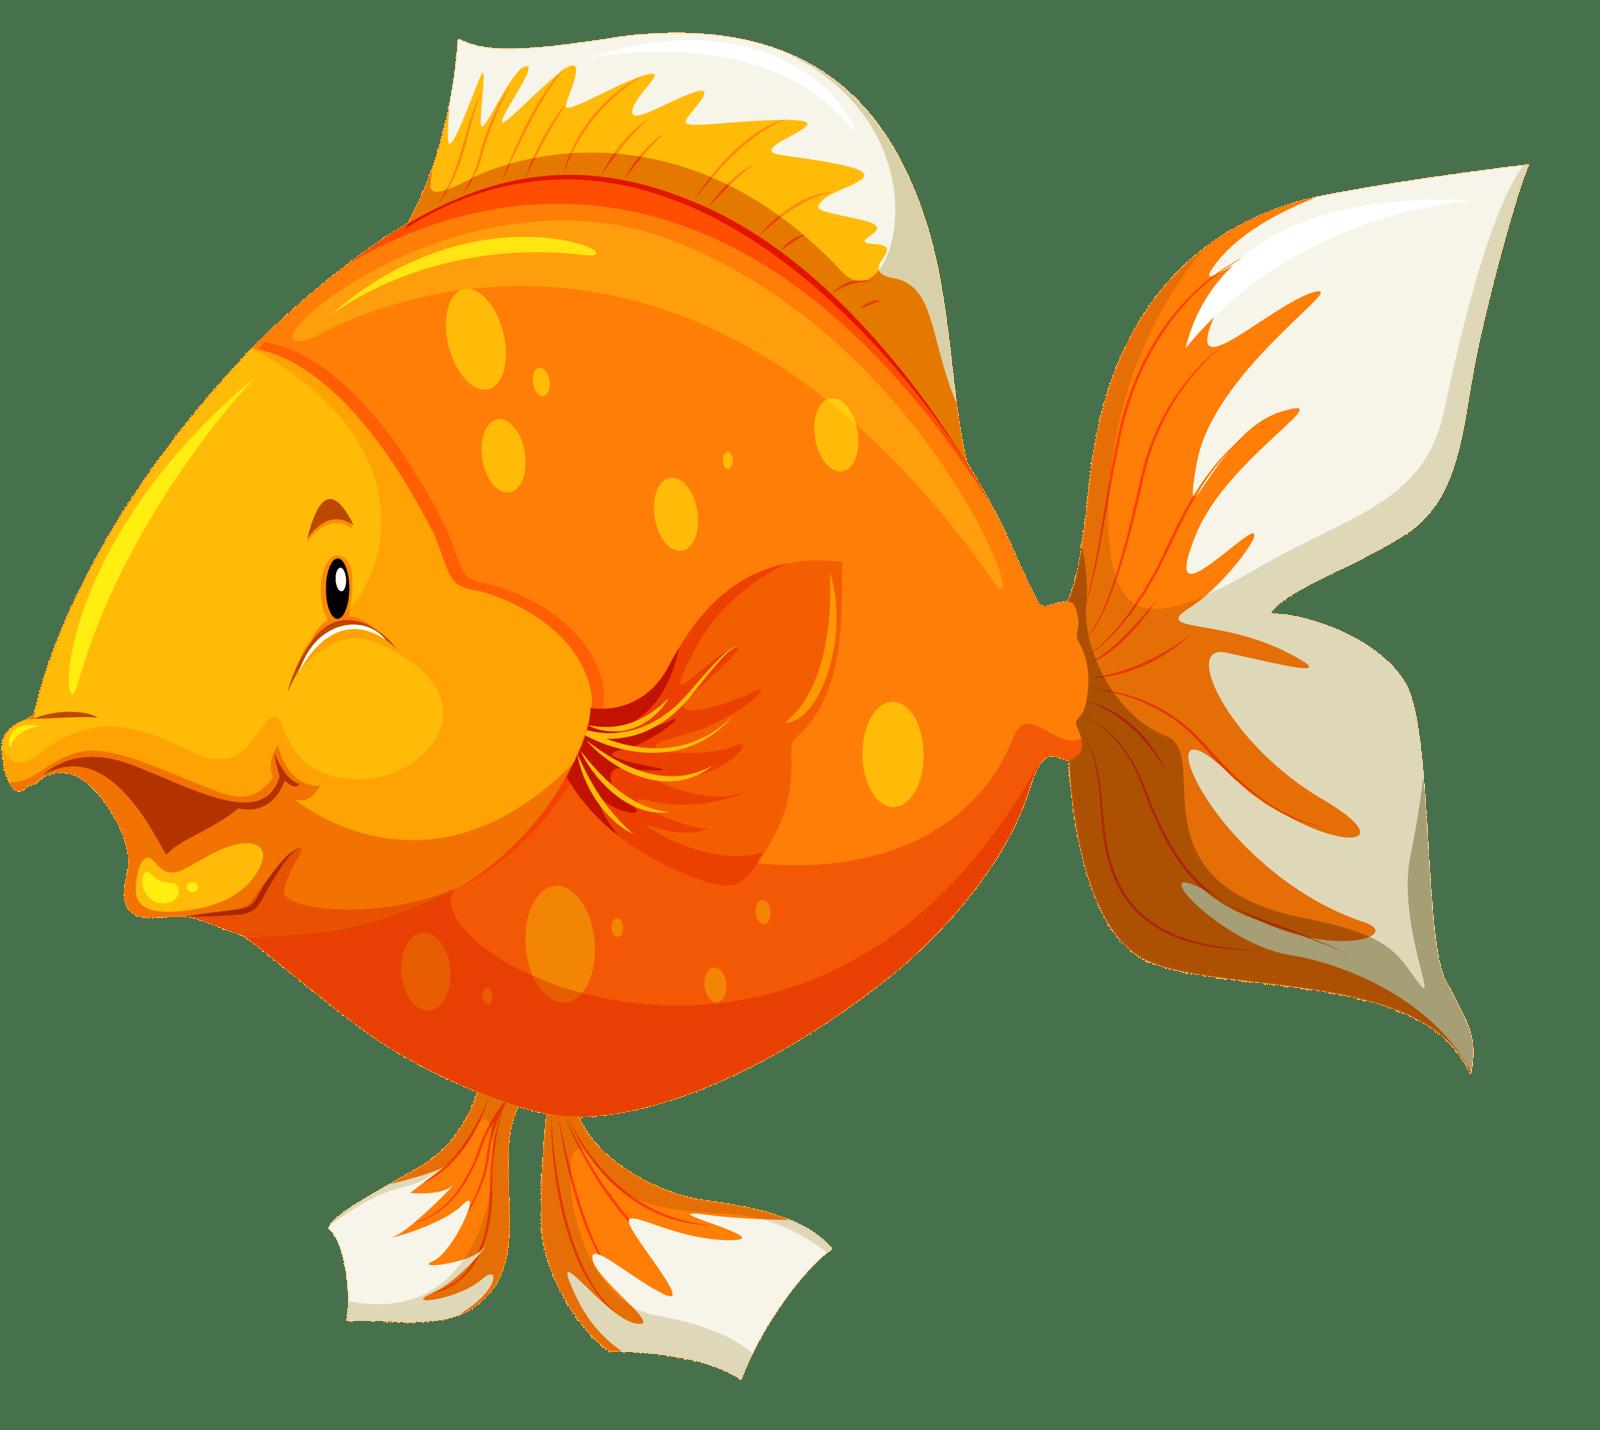 Fish sticks clipart clip transparent stock Fish Sticks Clipart - 2018 Clipart Gallery clip transparent stock